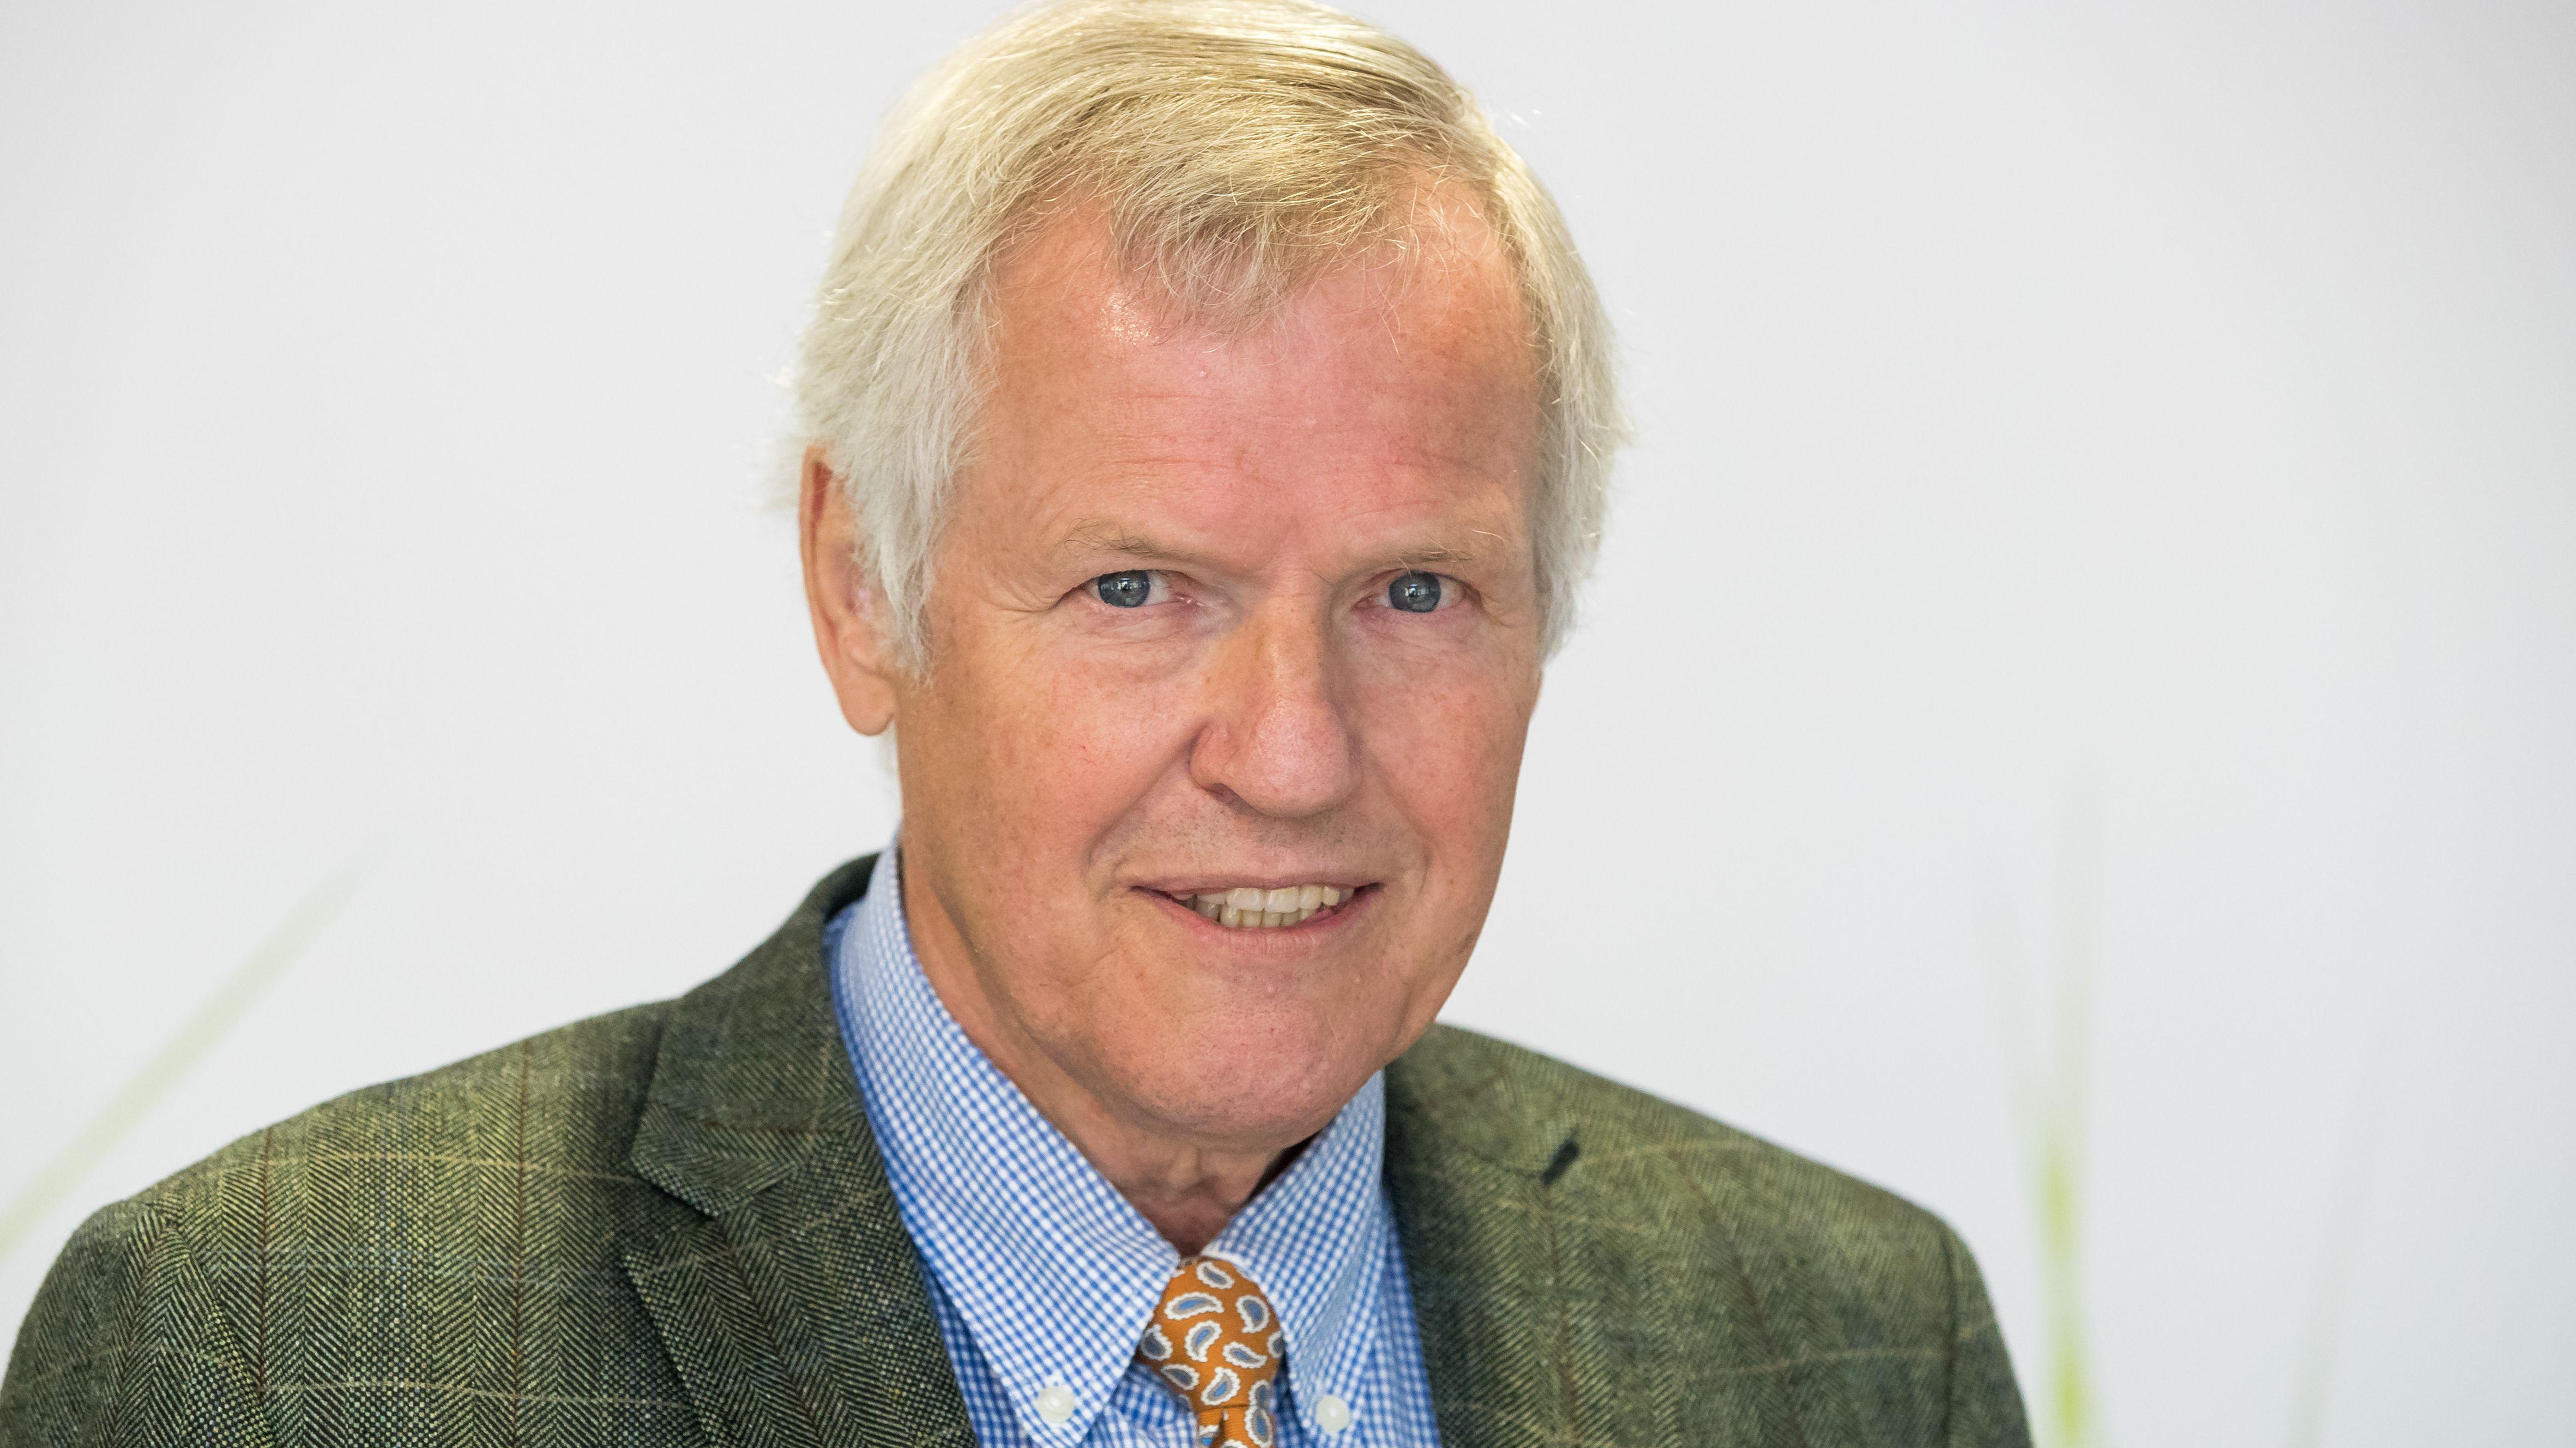 Jürgen Vocke, Präsident des Bayerischen Landesjagdverbands (BJV)